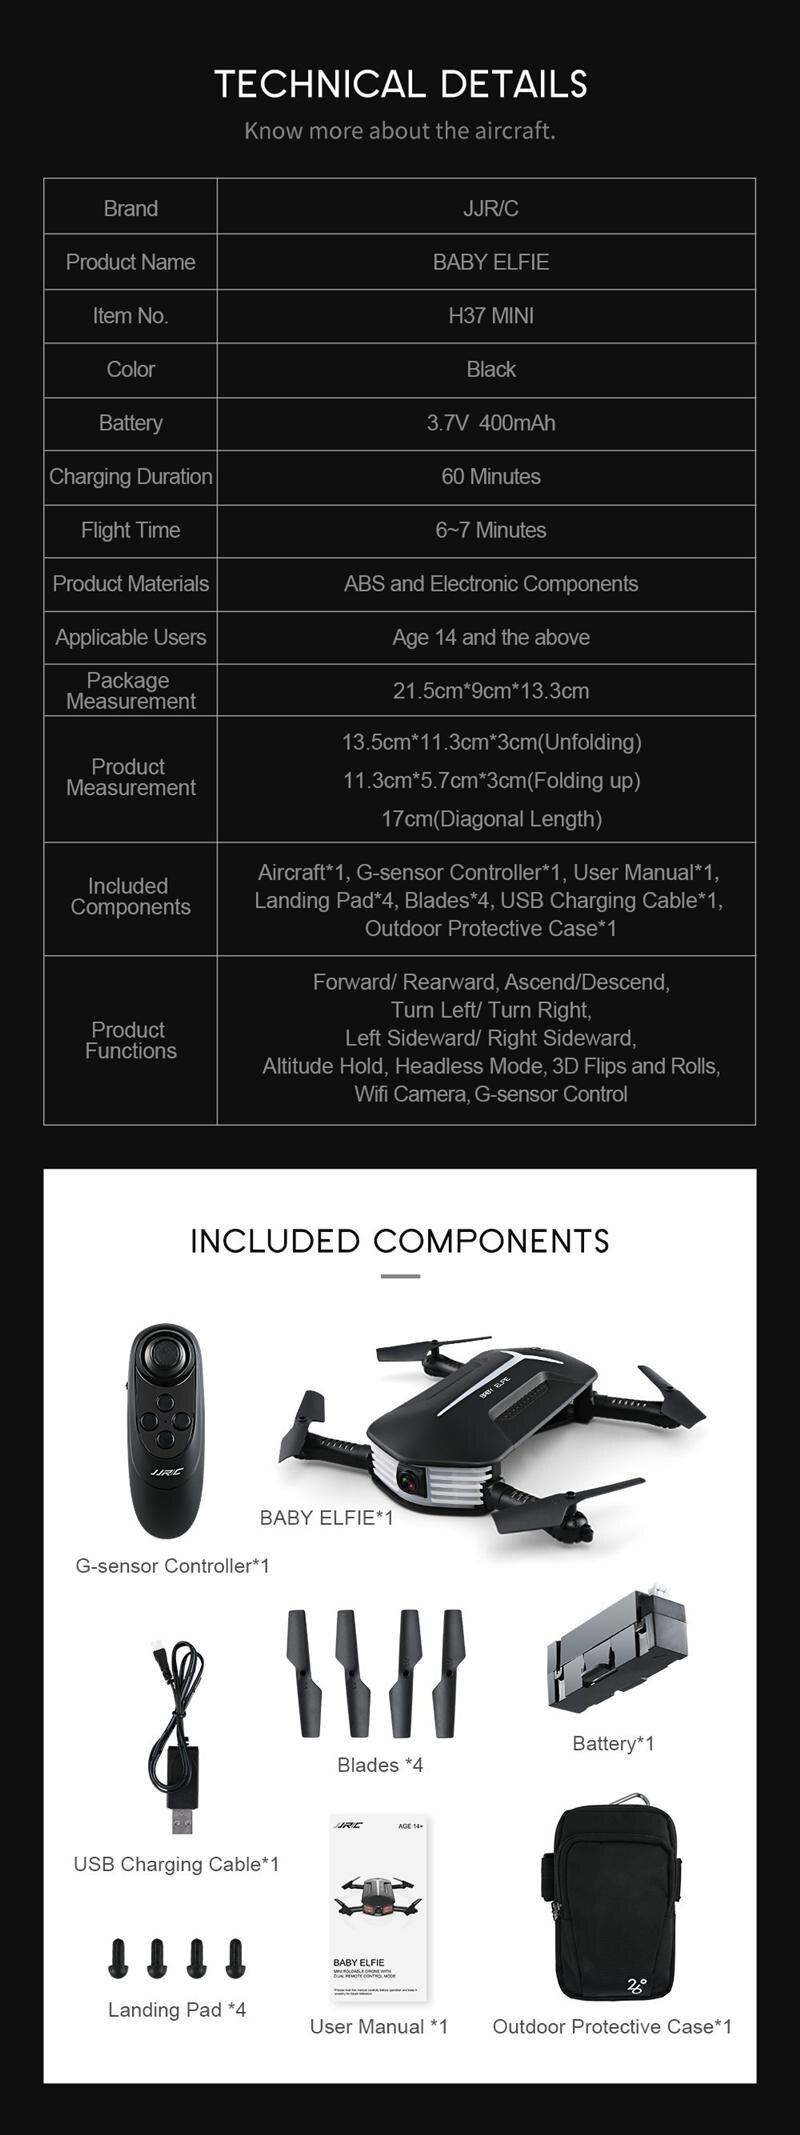 JJRC H37 mini 4CH 6 Axis WIFI FPV Mini Drone RC Selfie Quadcopter Camera Foldable